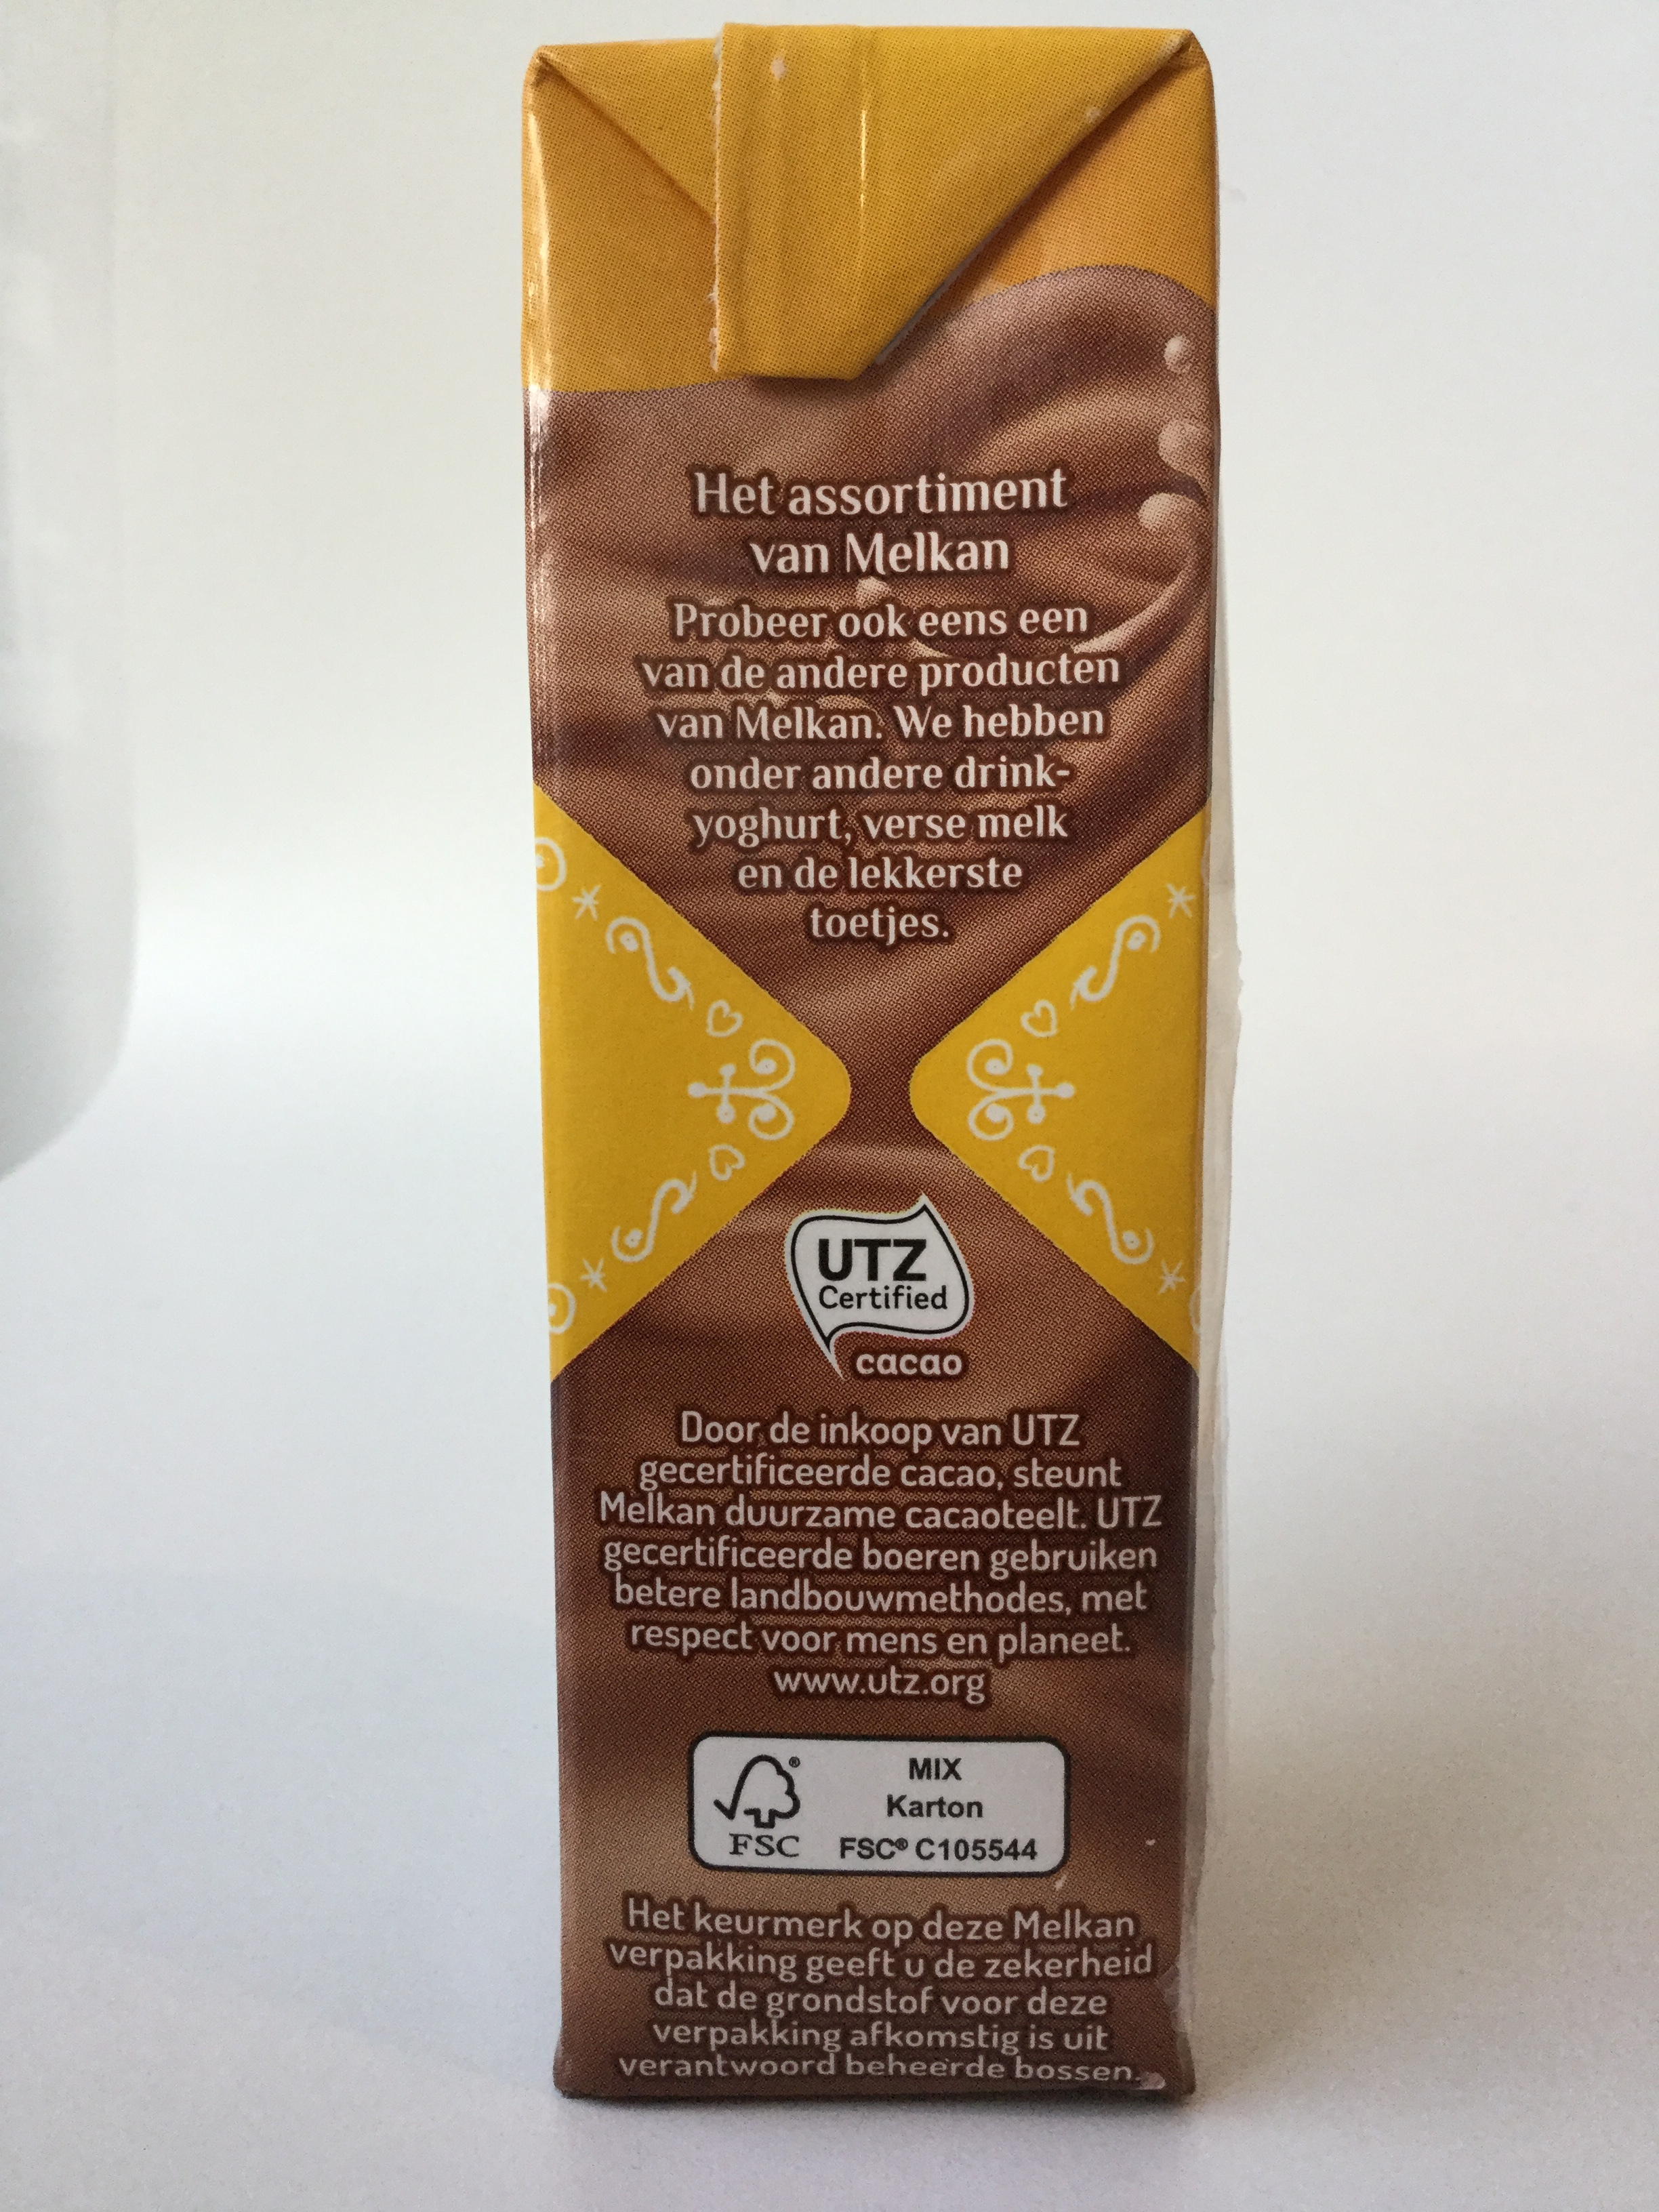 Melkan Light Chocolade Melk Side 2